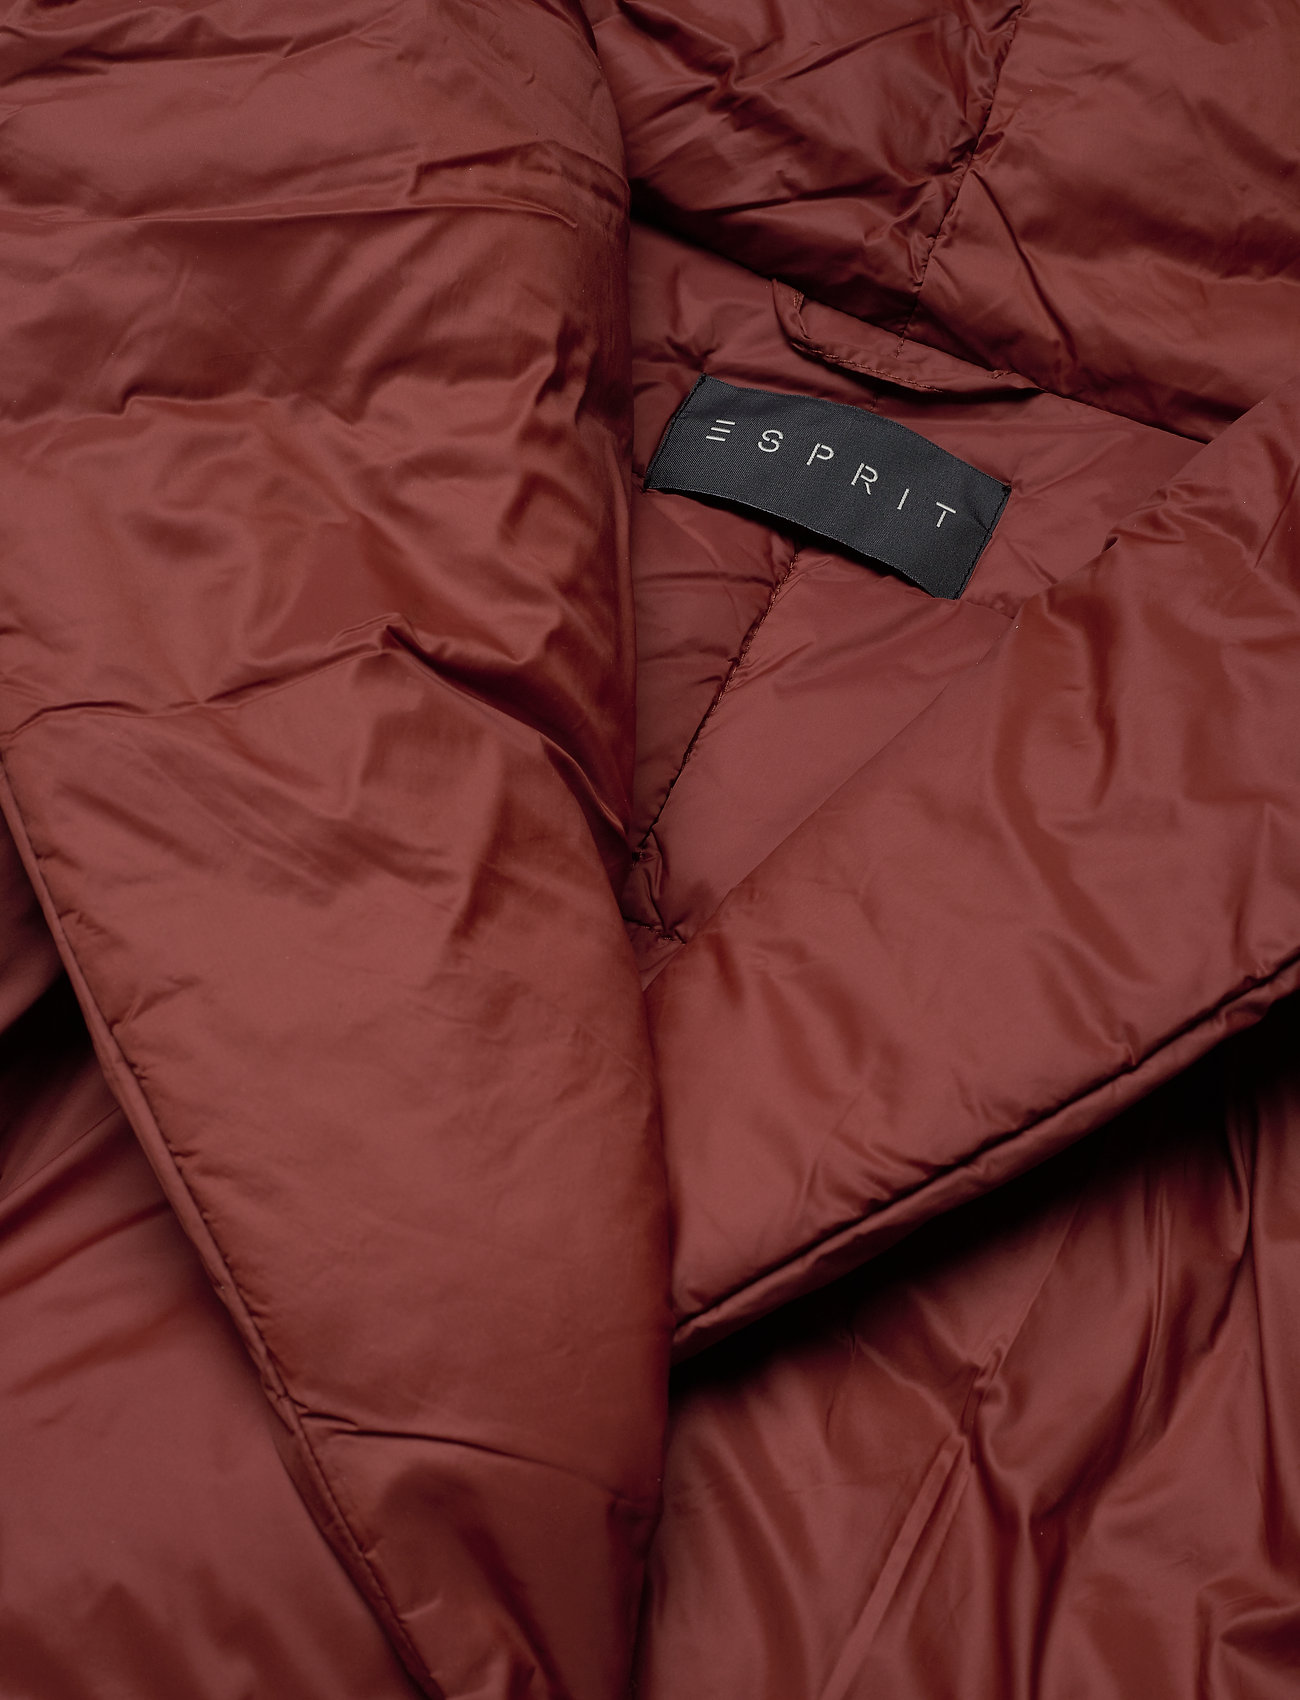 35Sale Woven Jackets ESPRIT Outdoor Rot Gefütterte Jacke kZXOiPuT